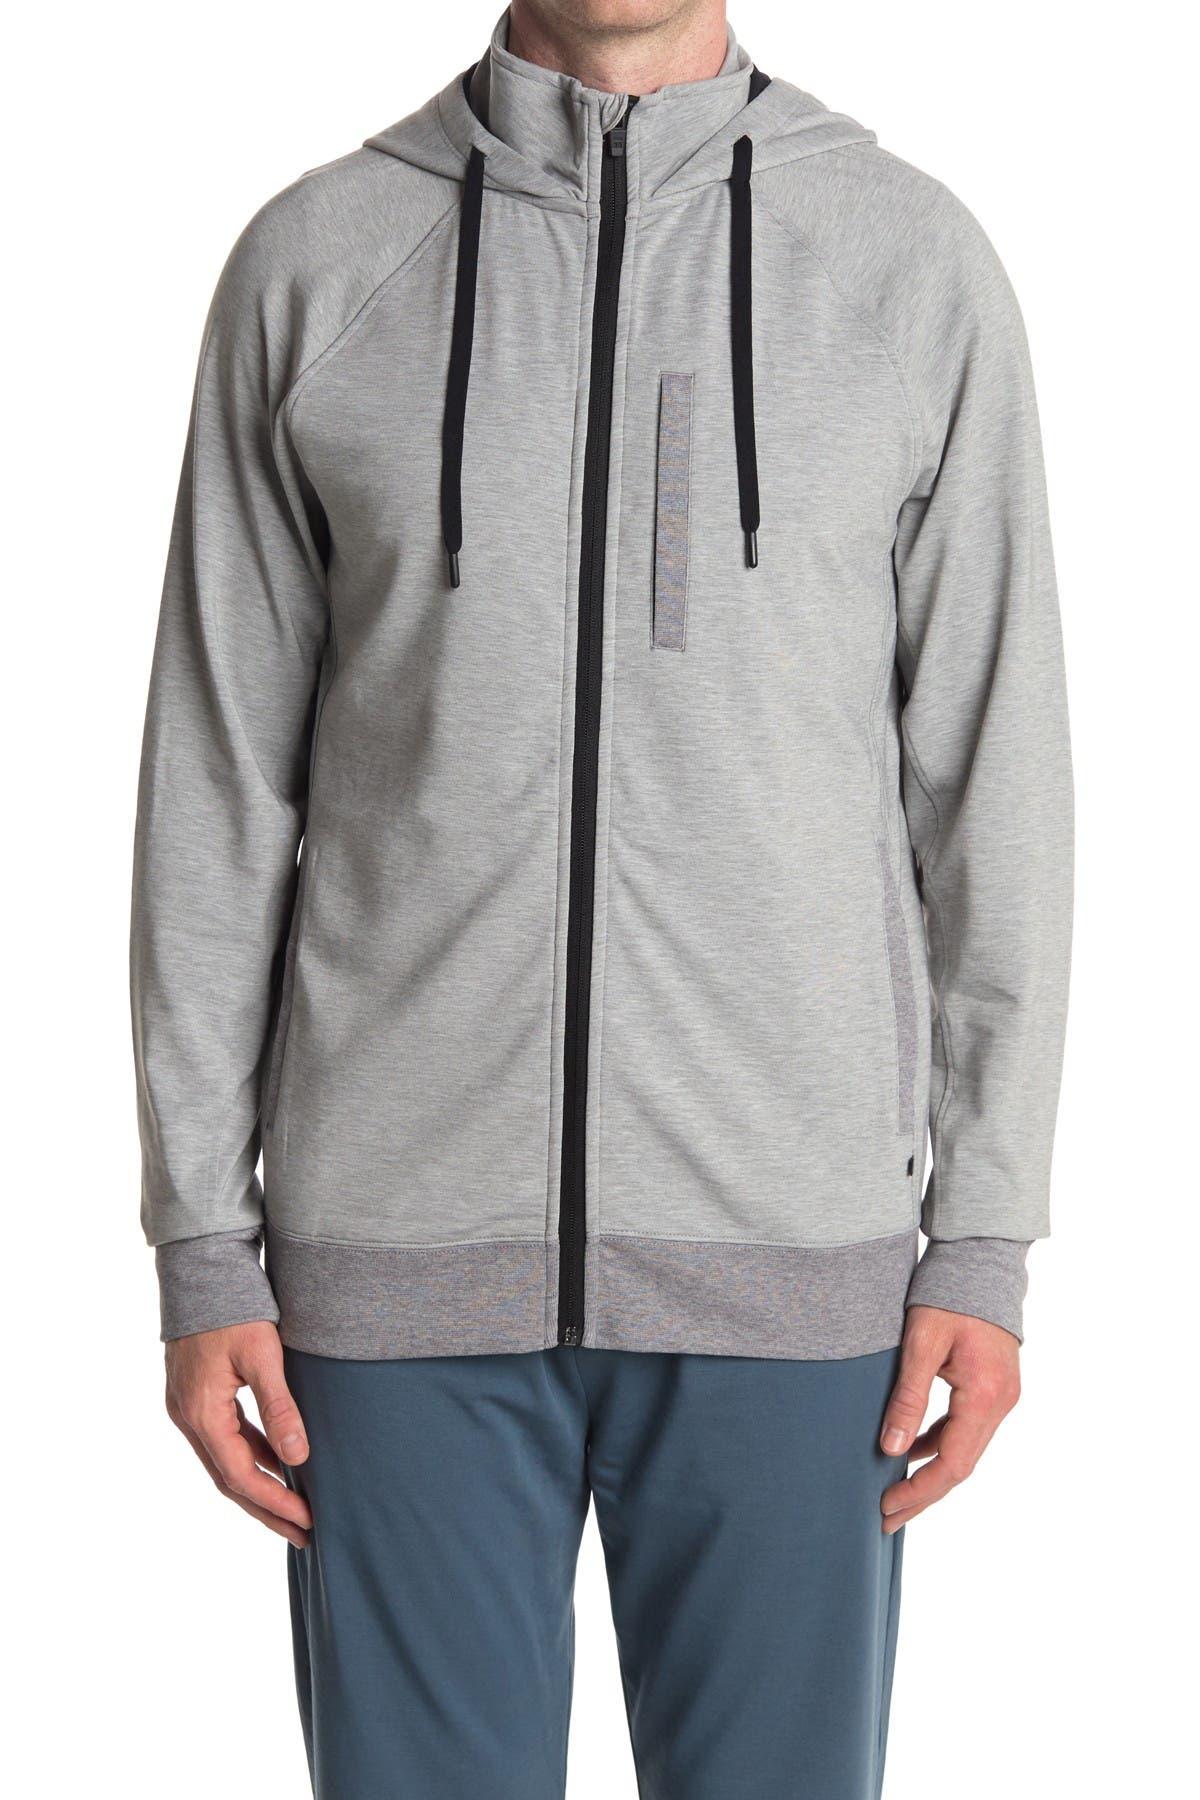 Tommy John Go Anywhere Dry Fleece Hoodie Jacket